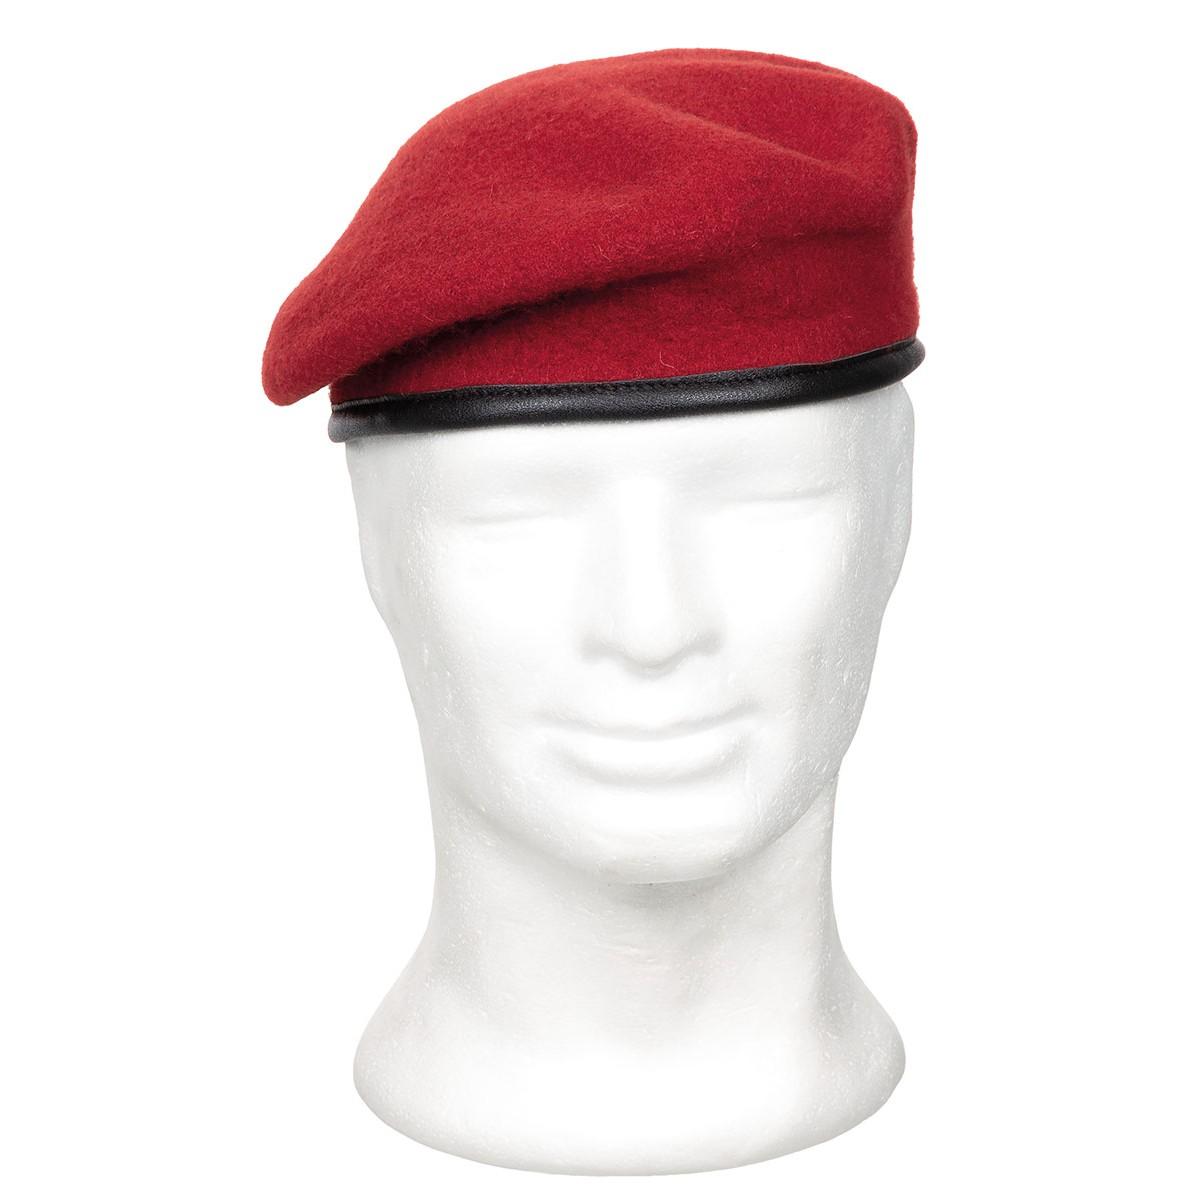 Crvena beretka MFH